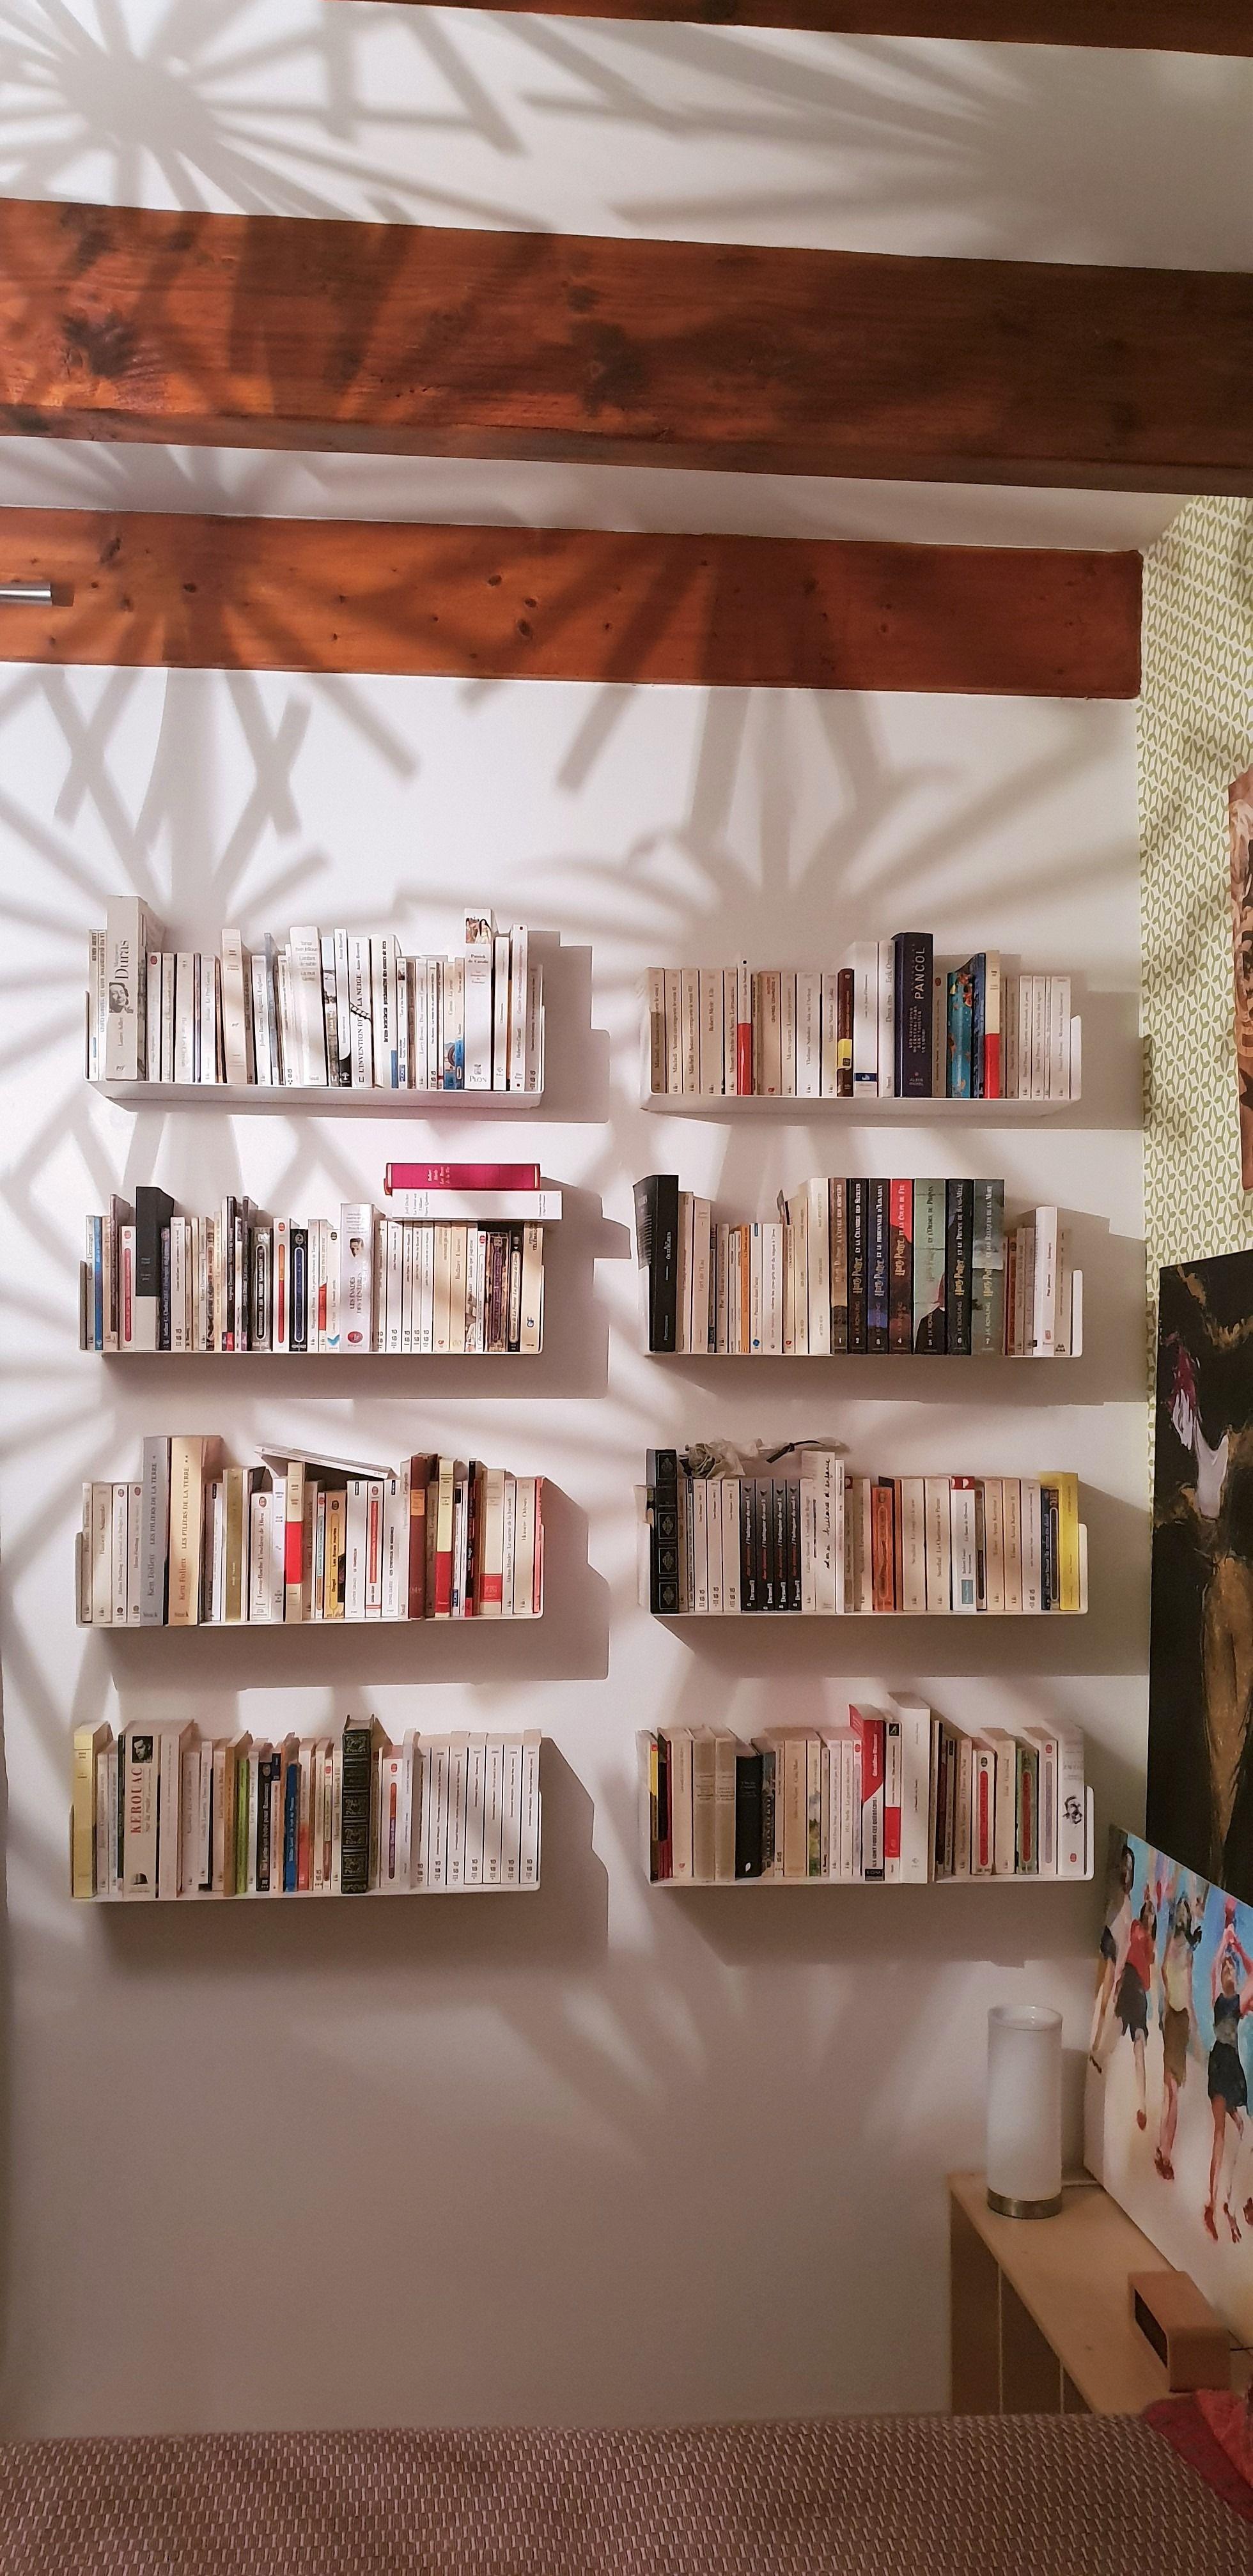 Cool Shelves Ideas For Your Home Bookshelves In Bedroom Wall Bookshelves Bookshelves For Small Spaces